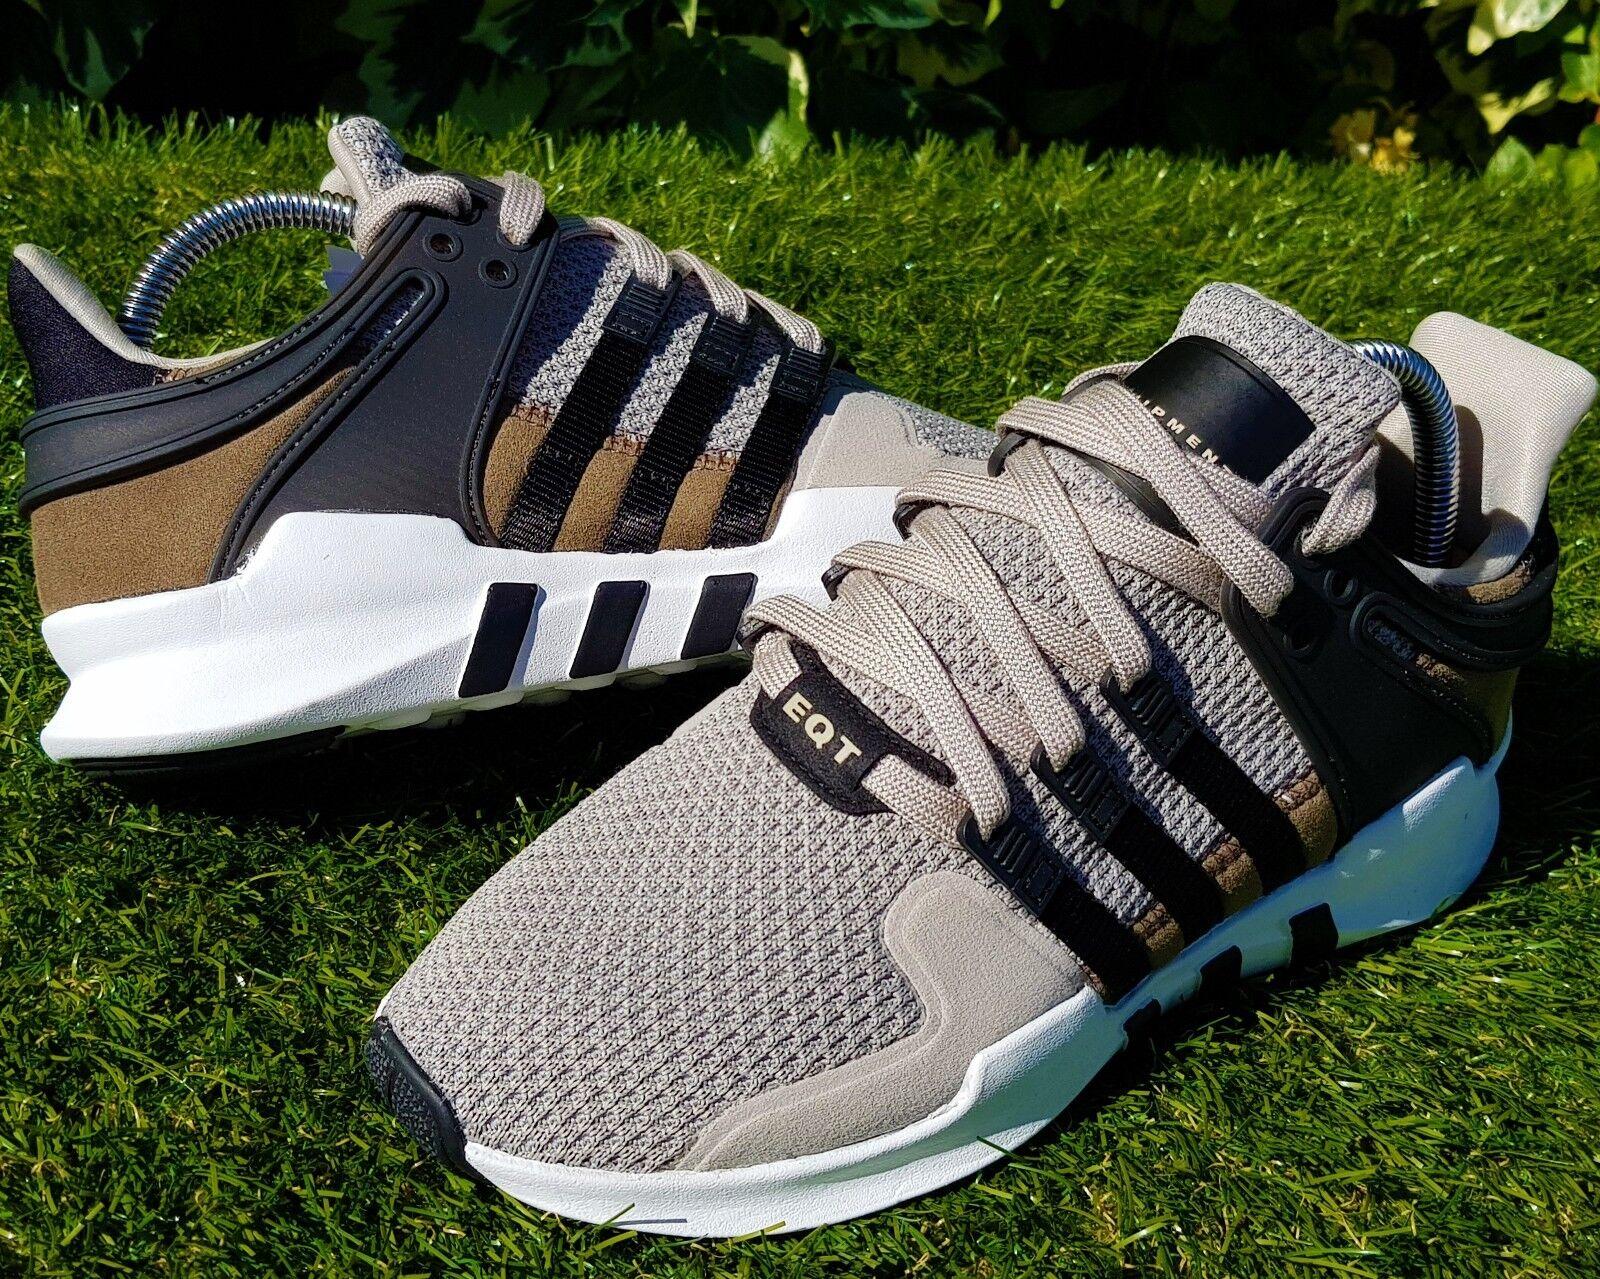 BNWB Adidas Originals Equipment ® EQT Support Adv 91/17 Trainers UK Größe 5.5